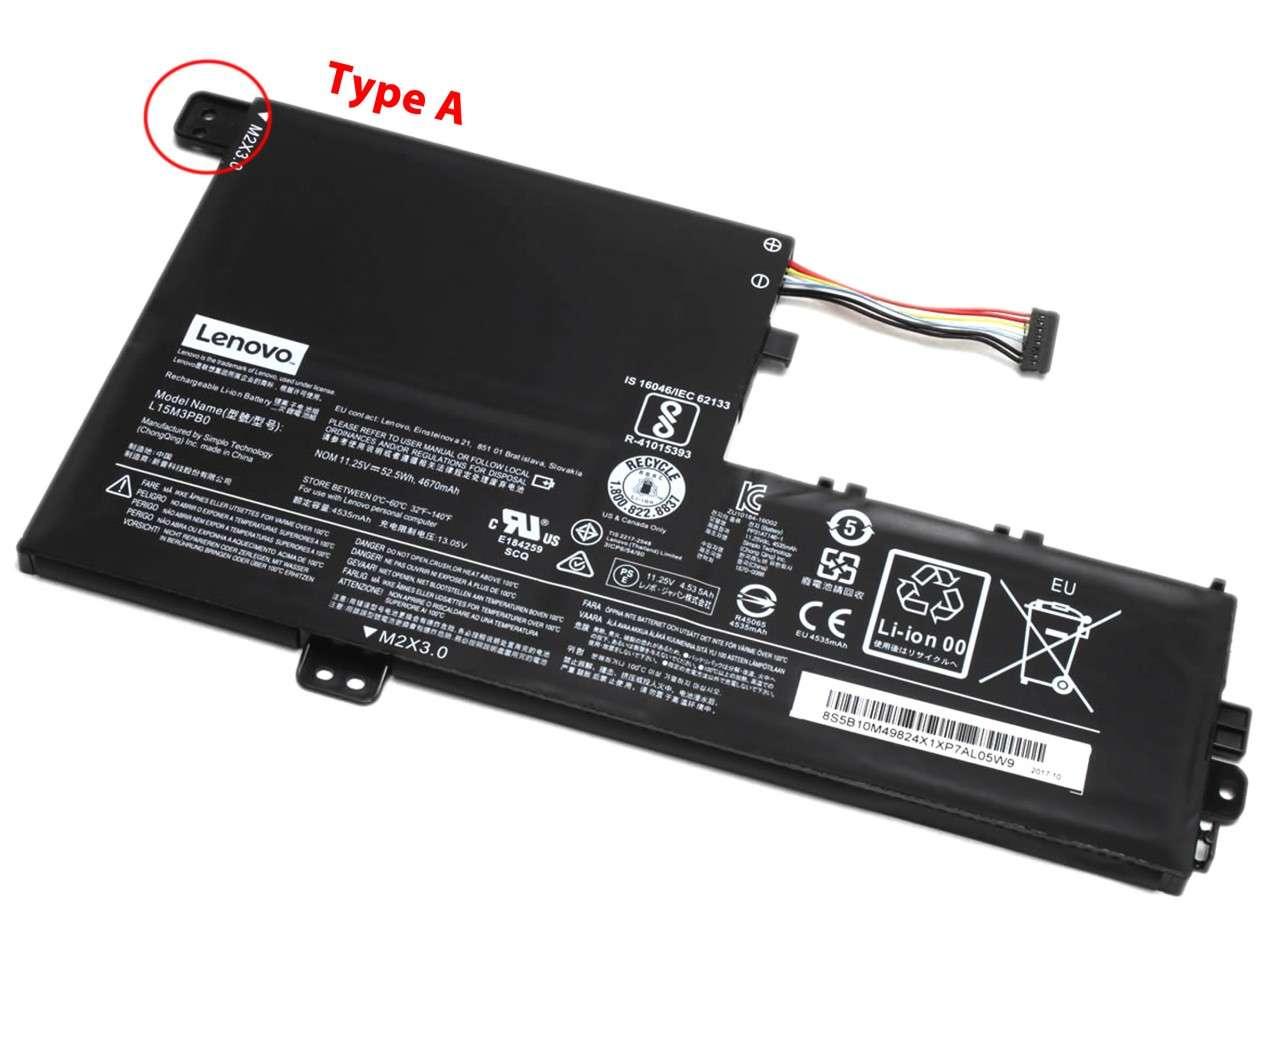 Baterie Lenovo Yoga 520 14IKB Originala 52.5Wh Type A imagine powerlaptop.ro 2021